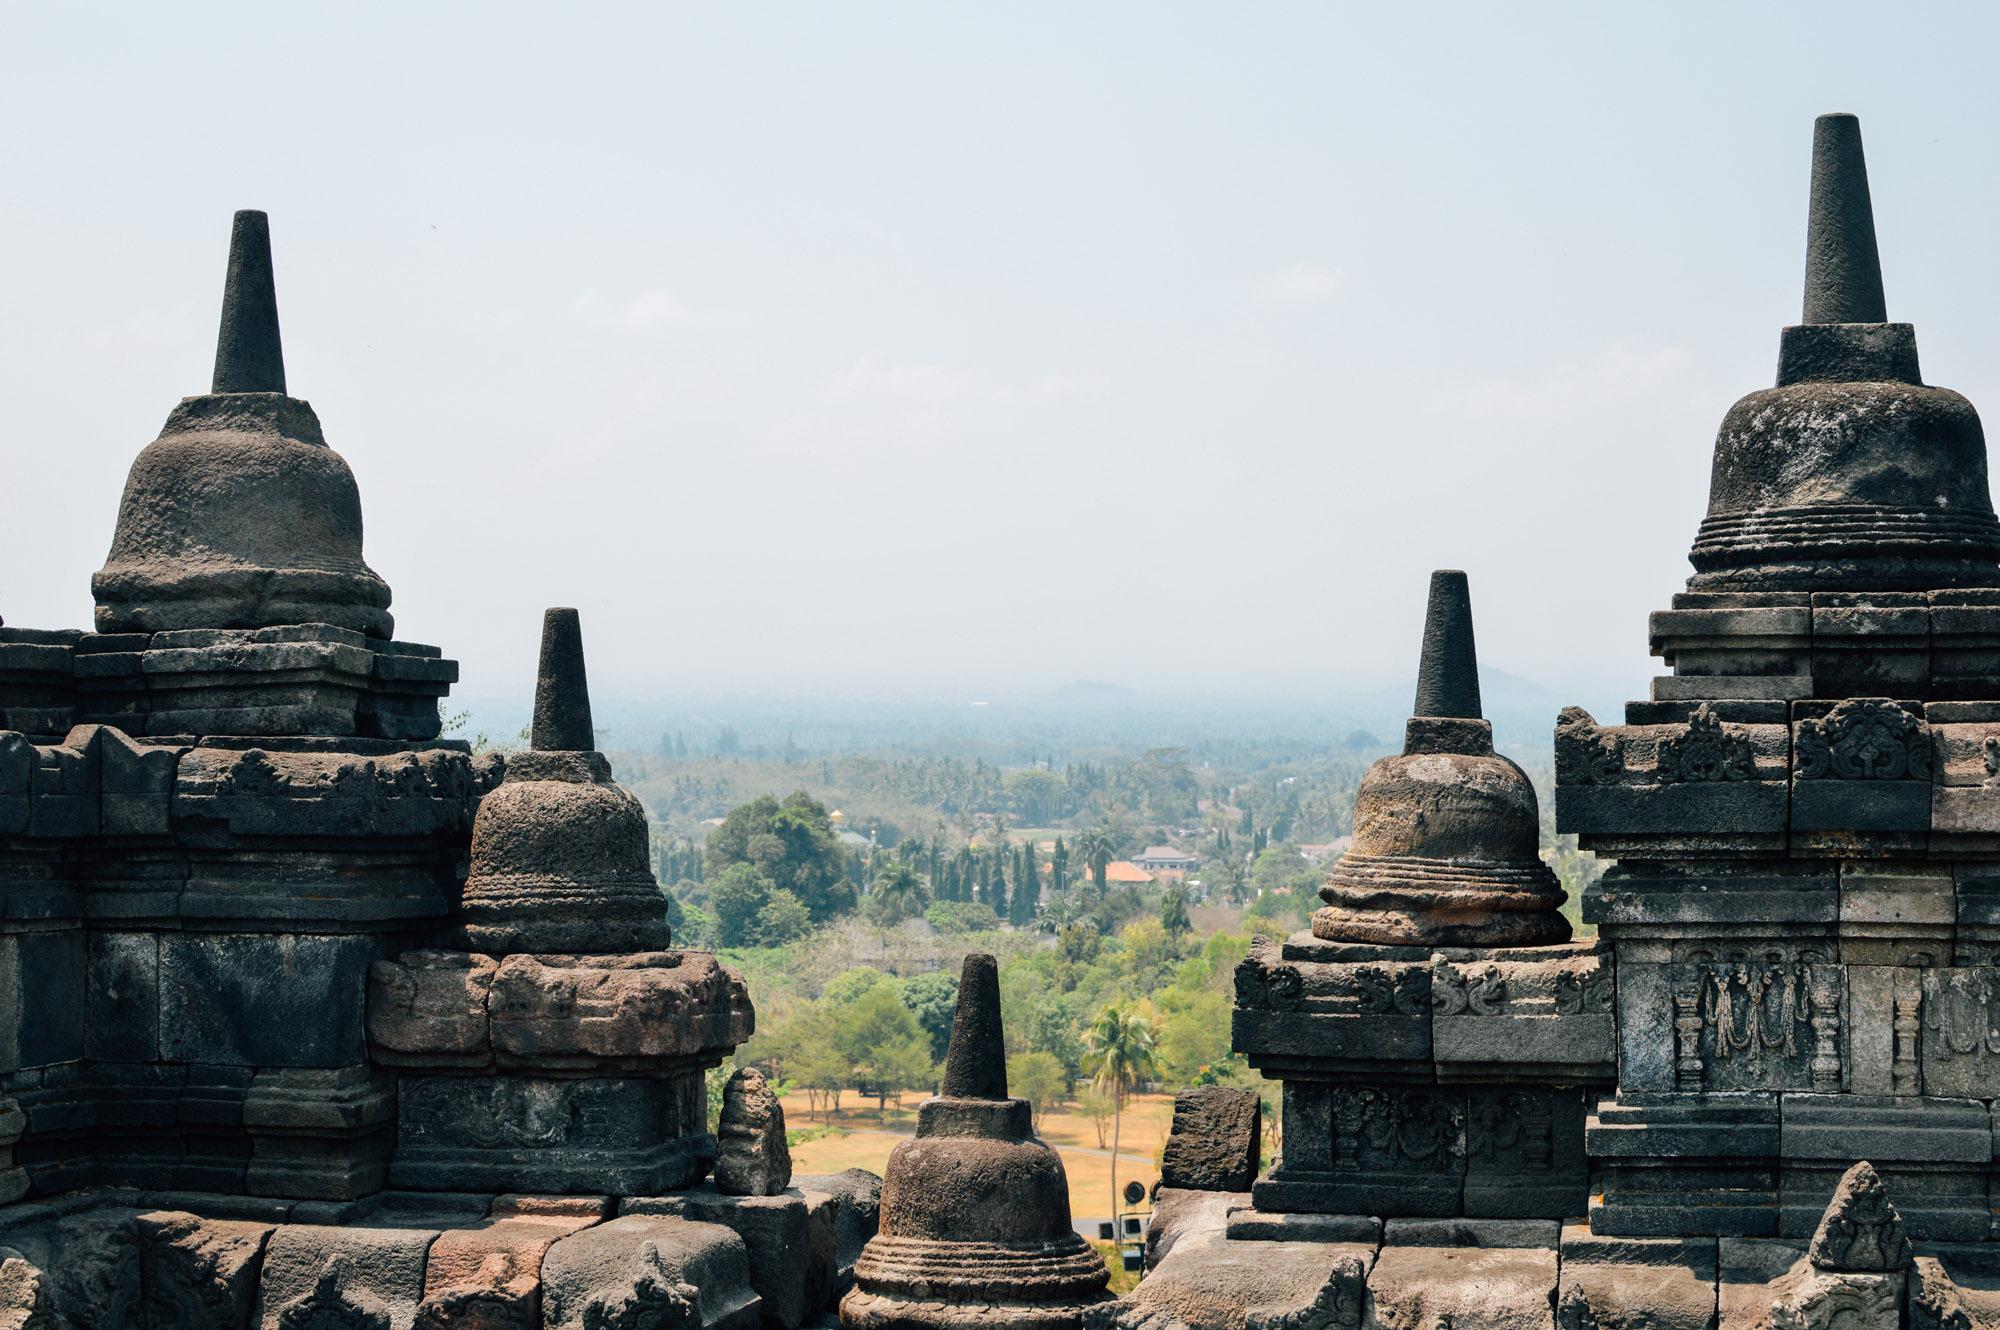 yogya 1 2 - Jogyakarta with Temples